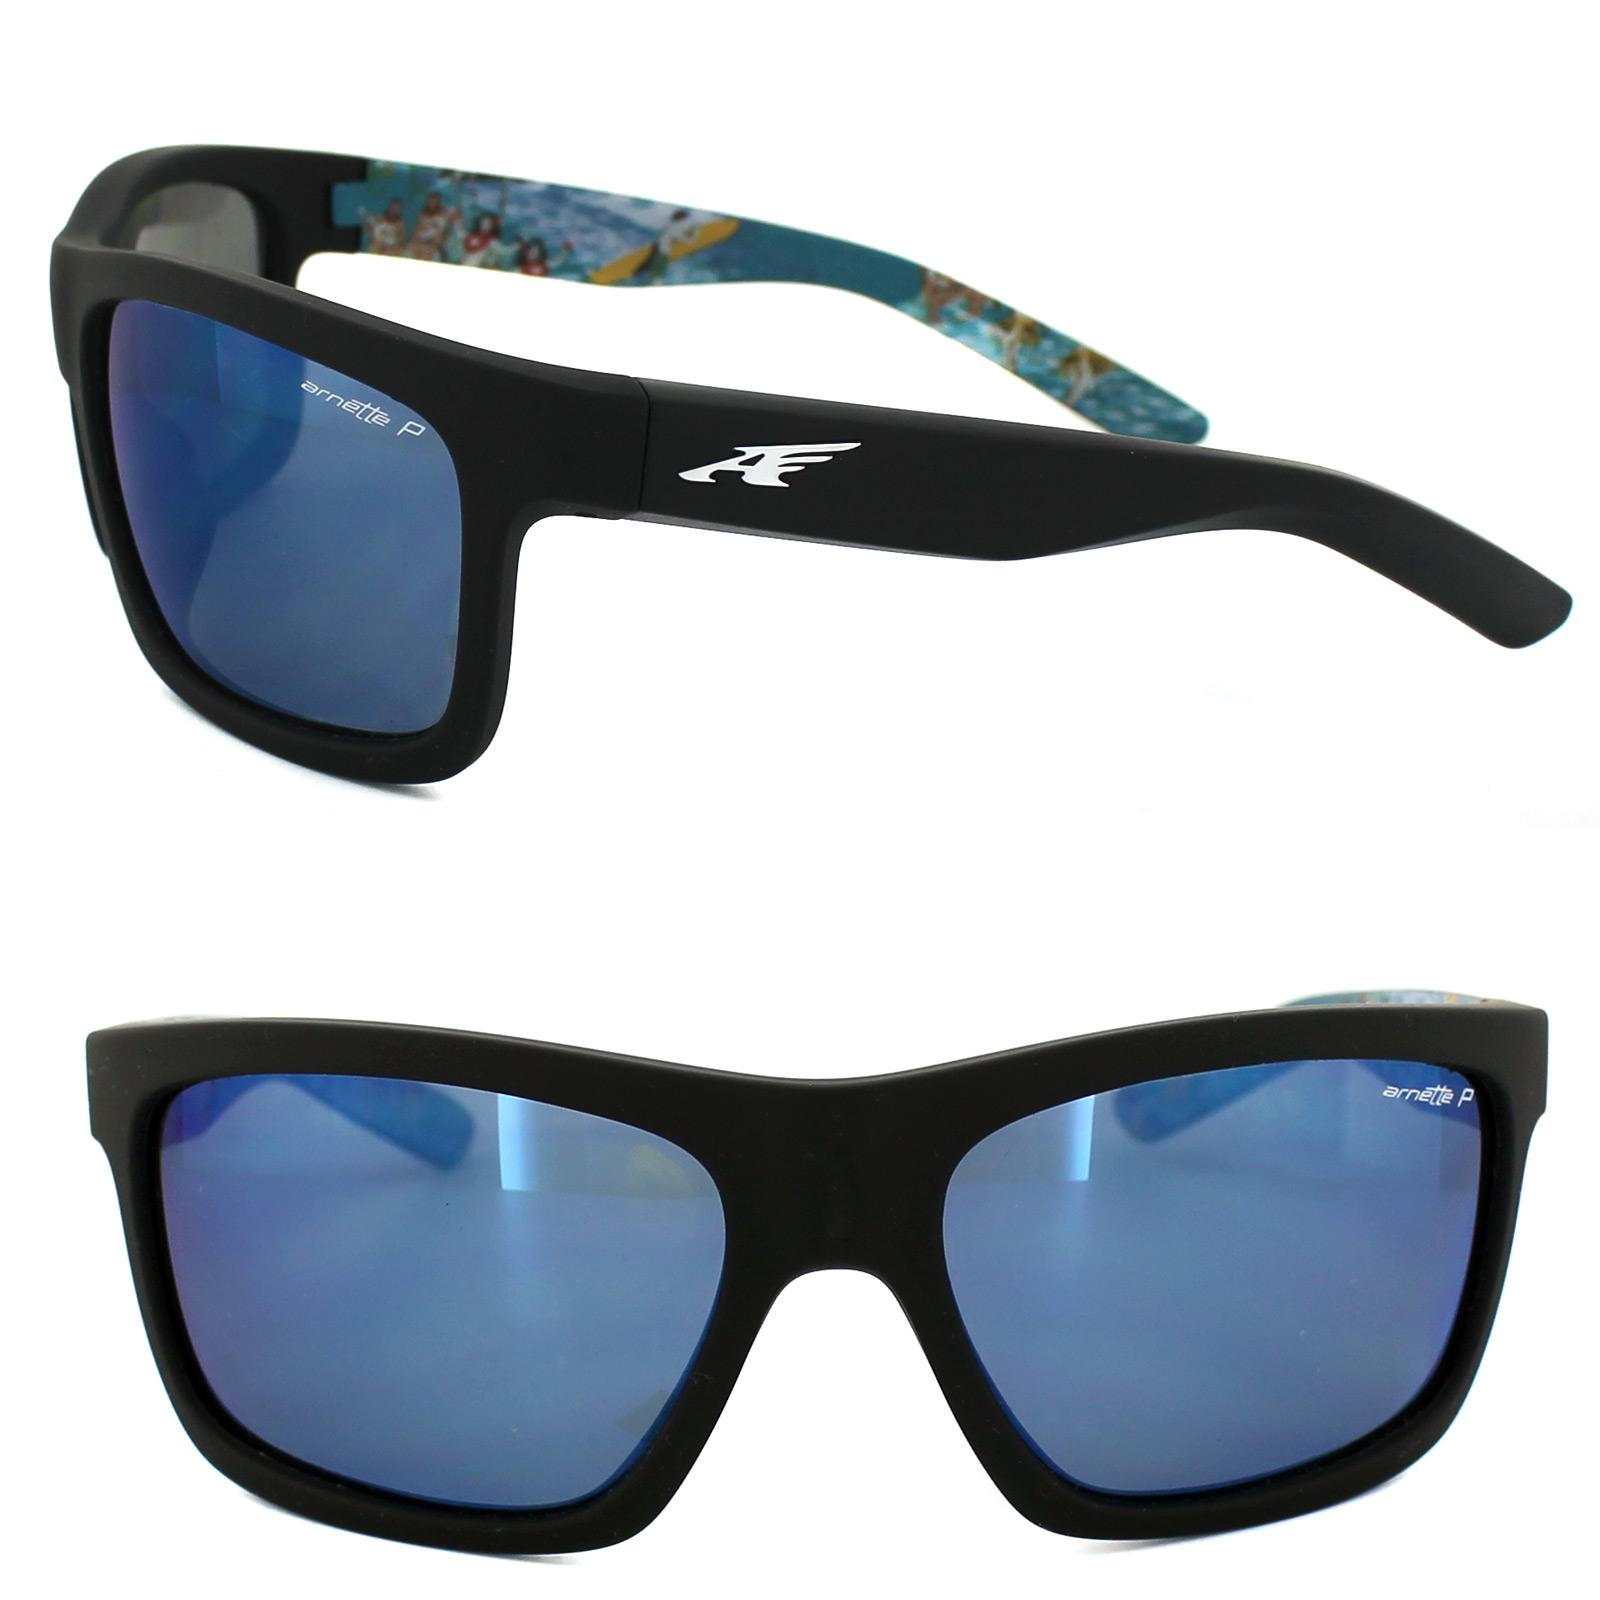 d37027dea4 Sentinel Arnette Sunglasses 4190 Easy Money 2222/22 Black Aloha Blue Mirror  Polarized